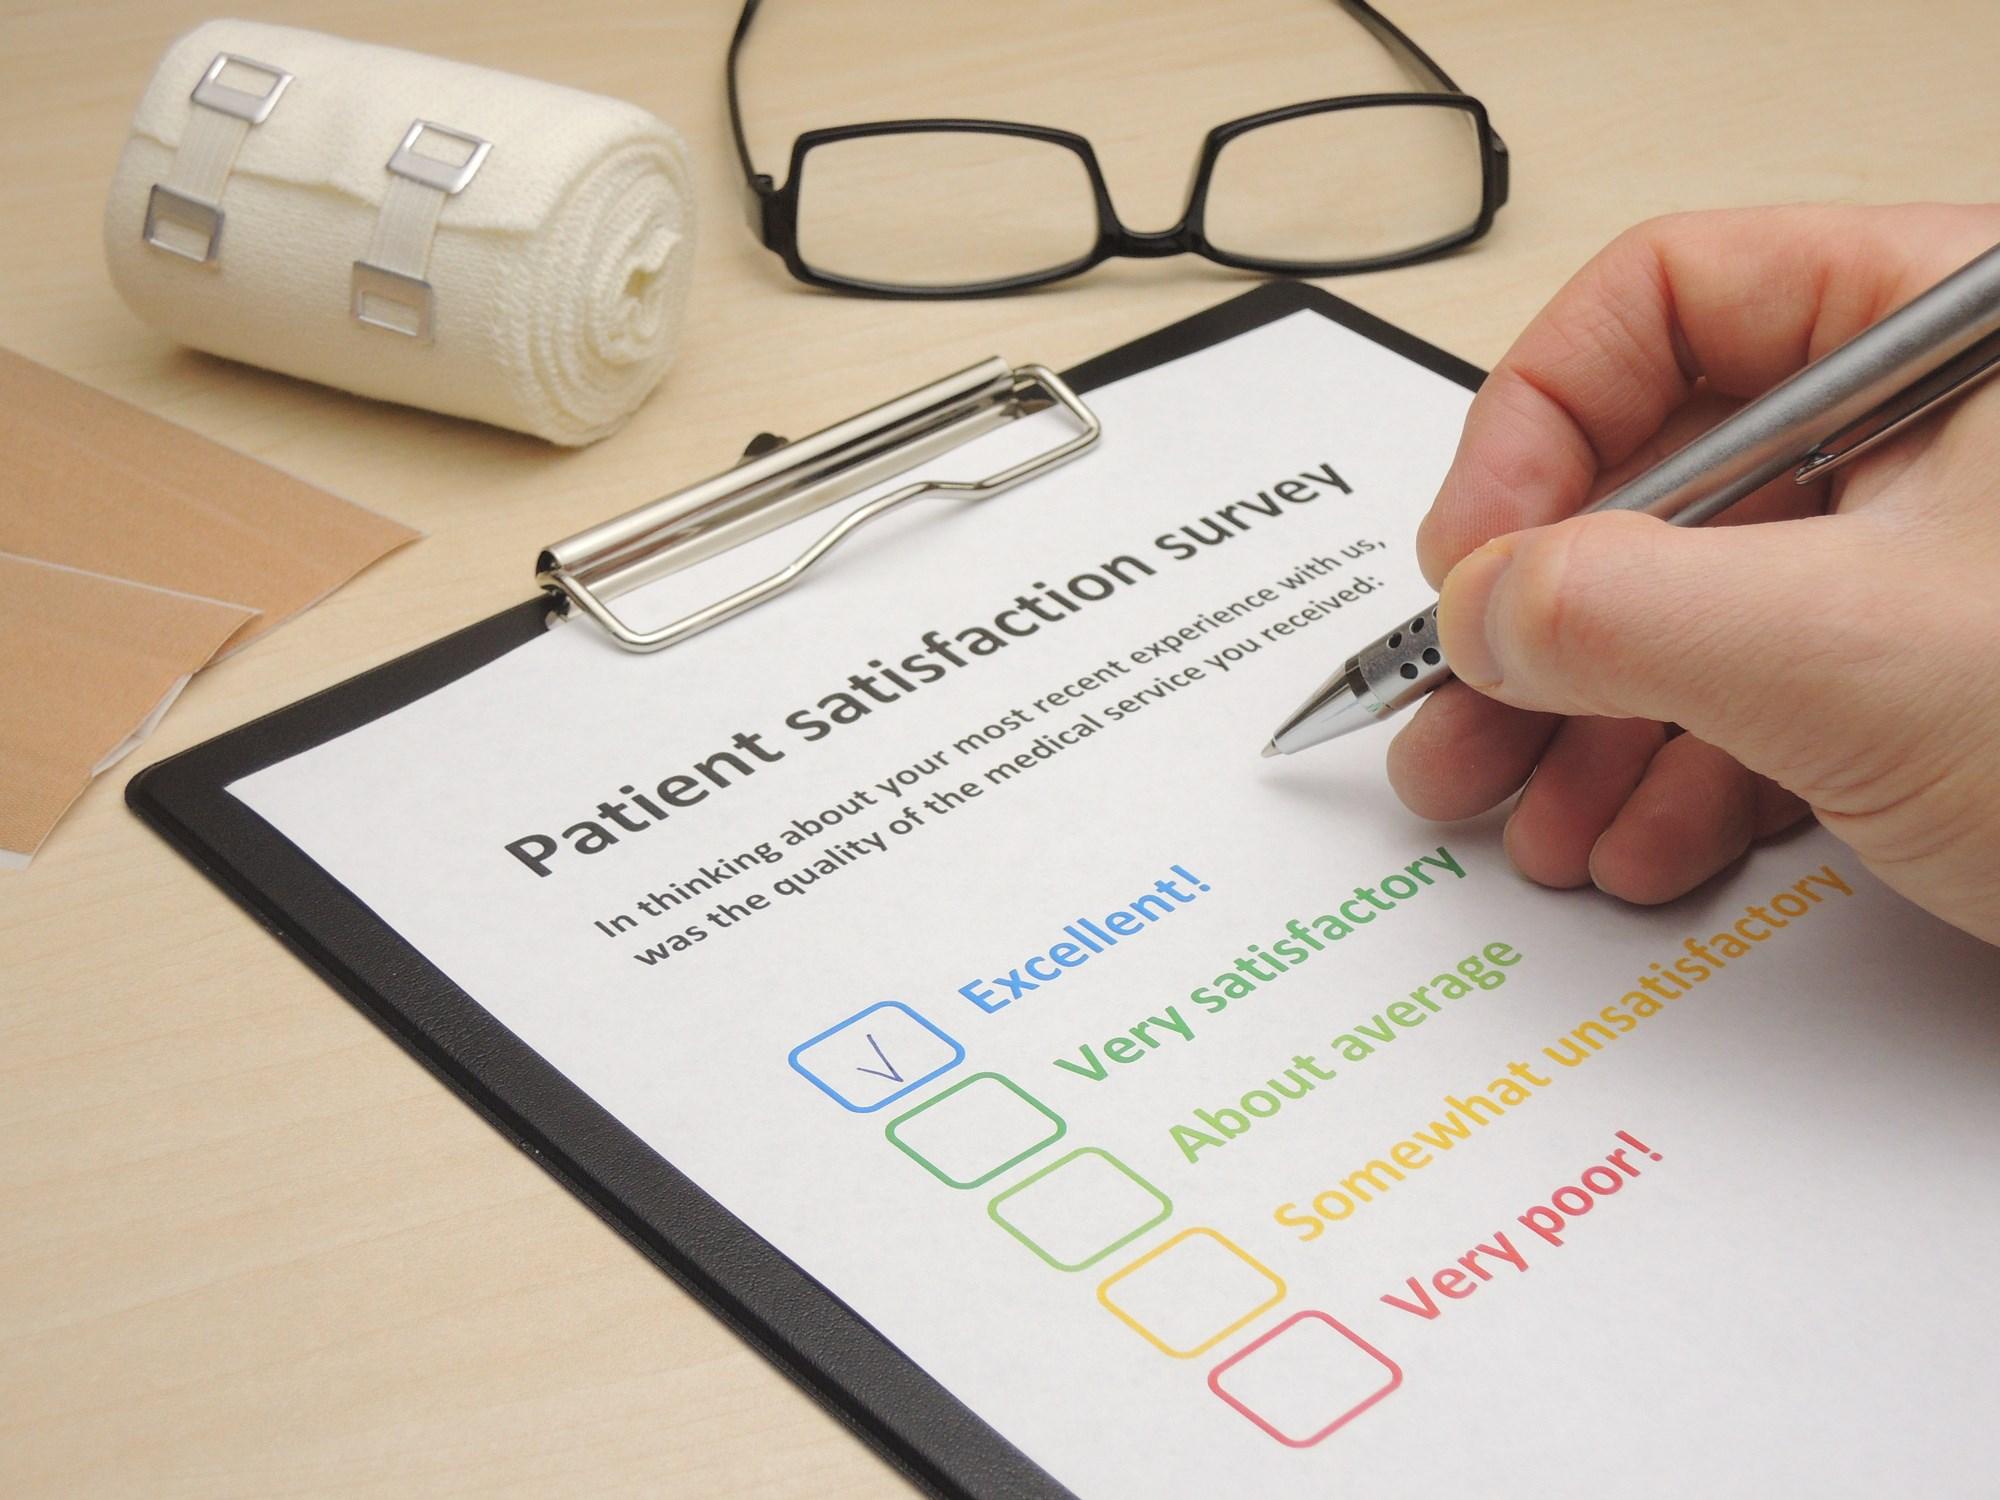 Online Physician Reviews Don't Reflect Patient Satisfaction Surveys